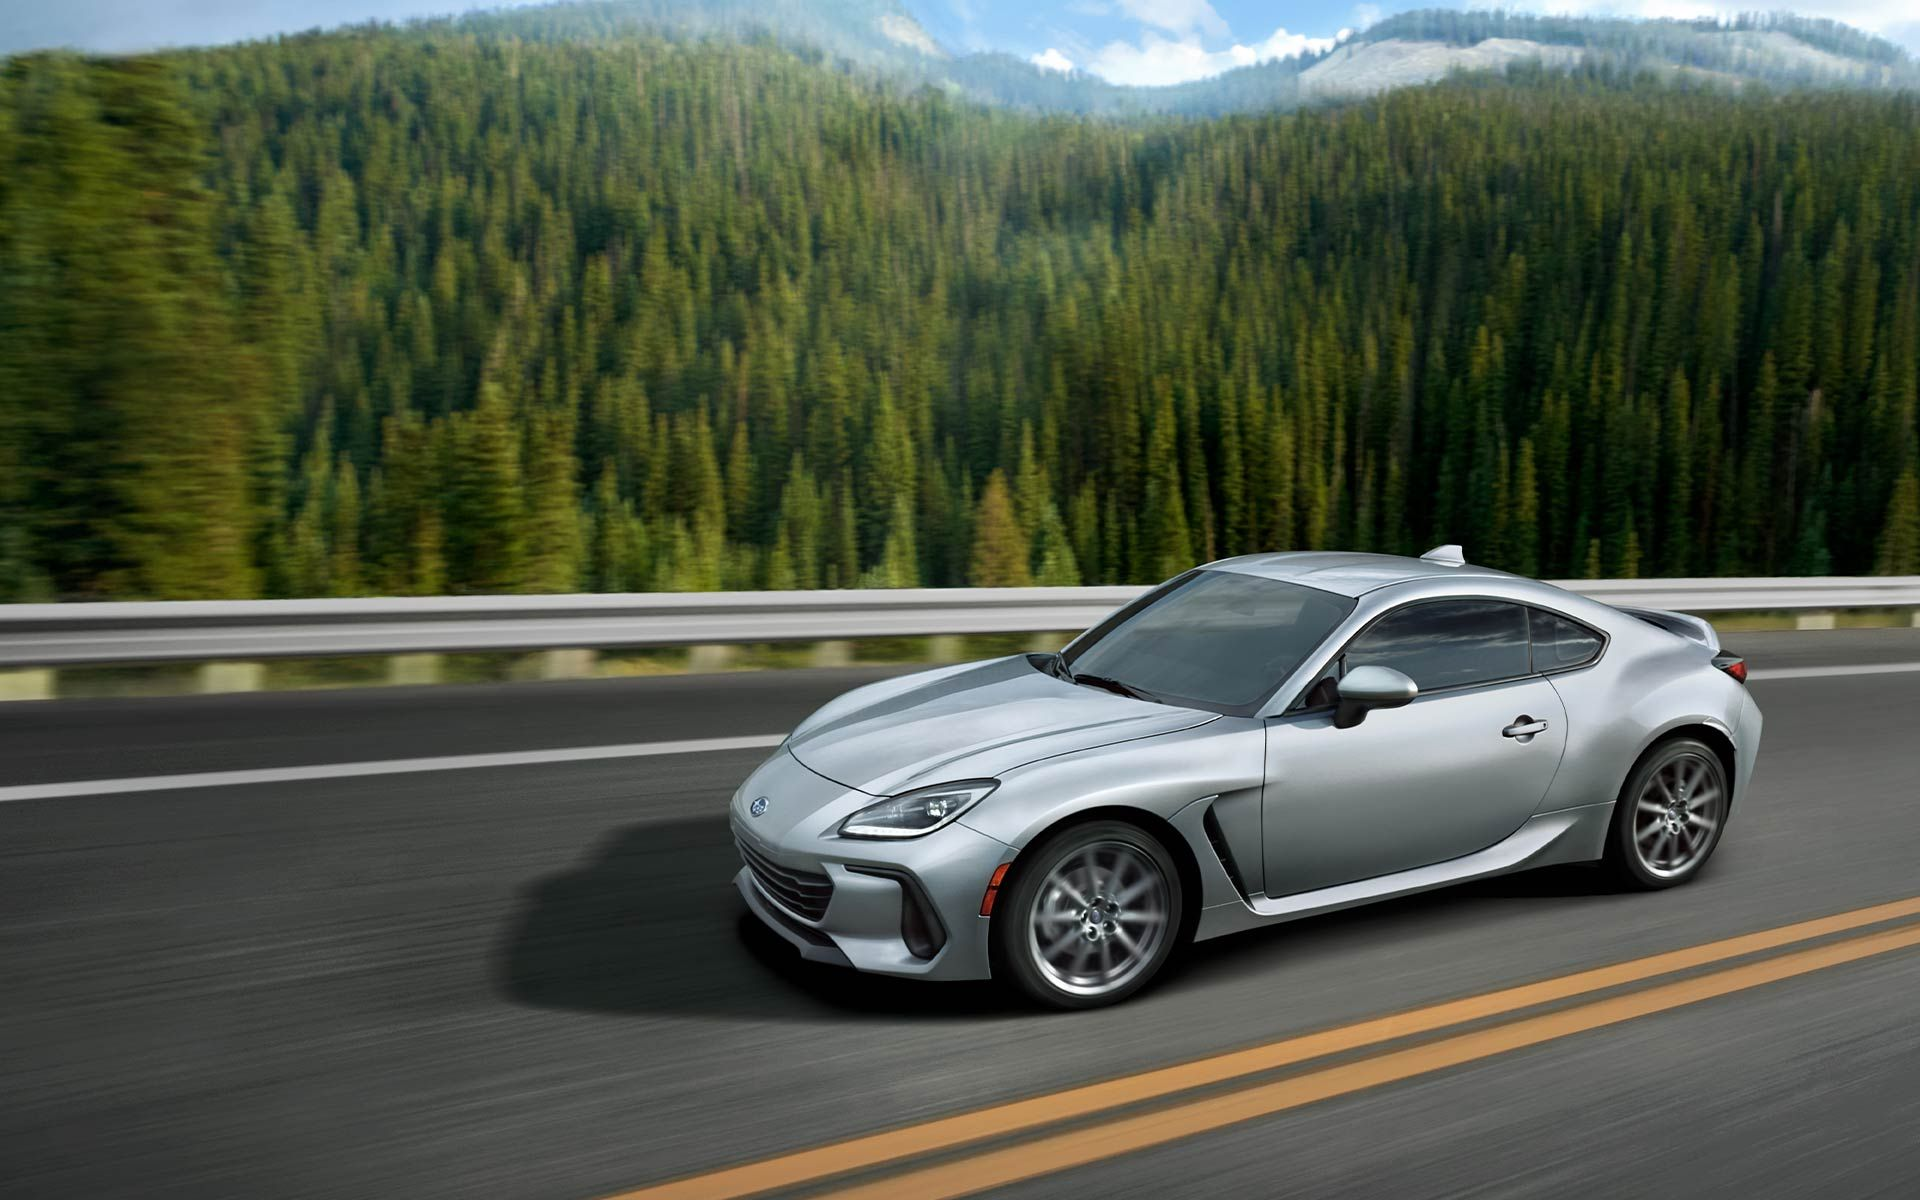 Next Generation 2022 Subaru Brz Uses All New 2 4l Boxer Engine In 2021 Subaru Brz Subaru Sports Car